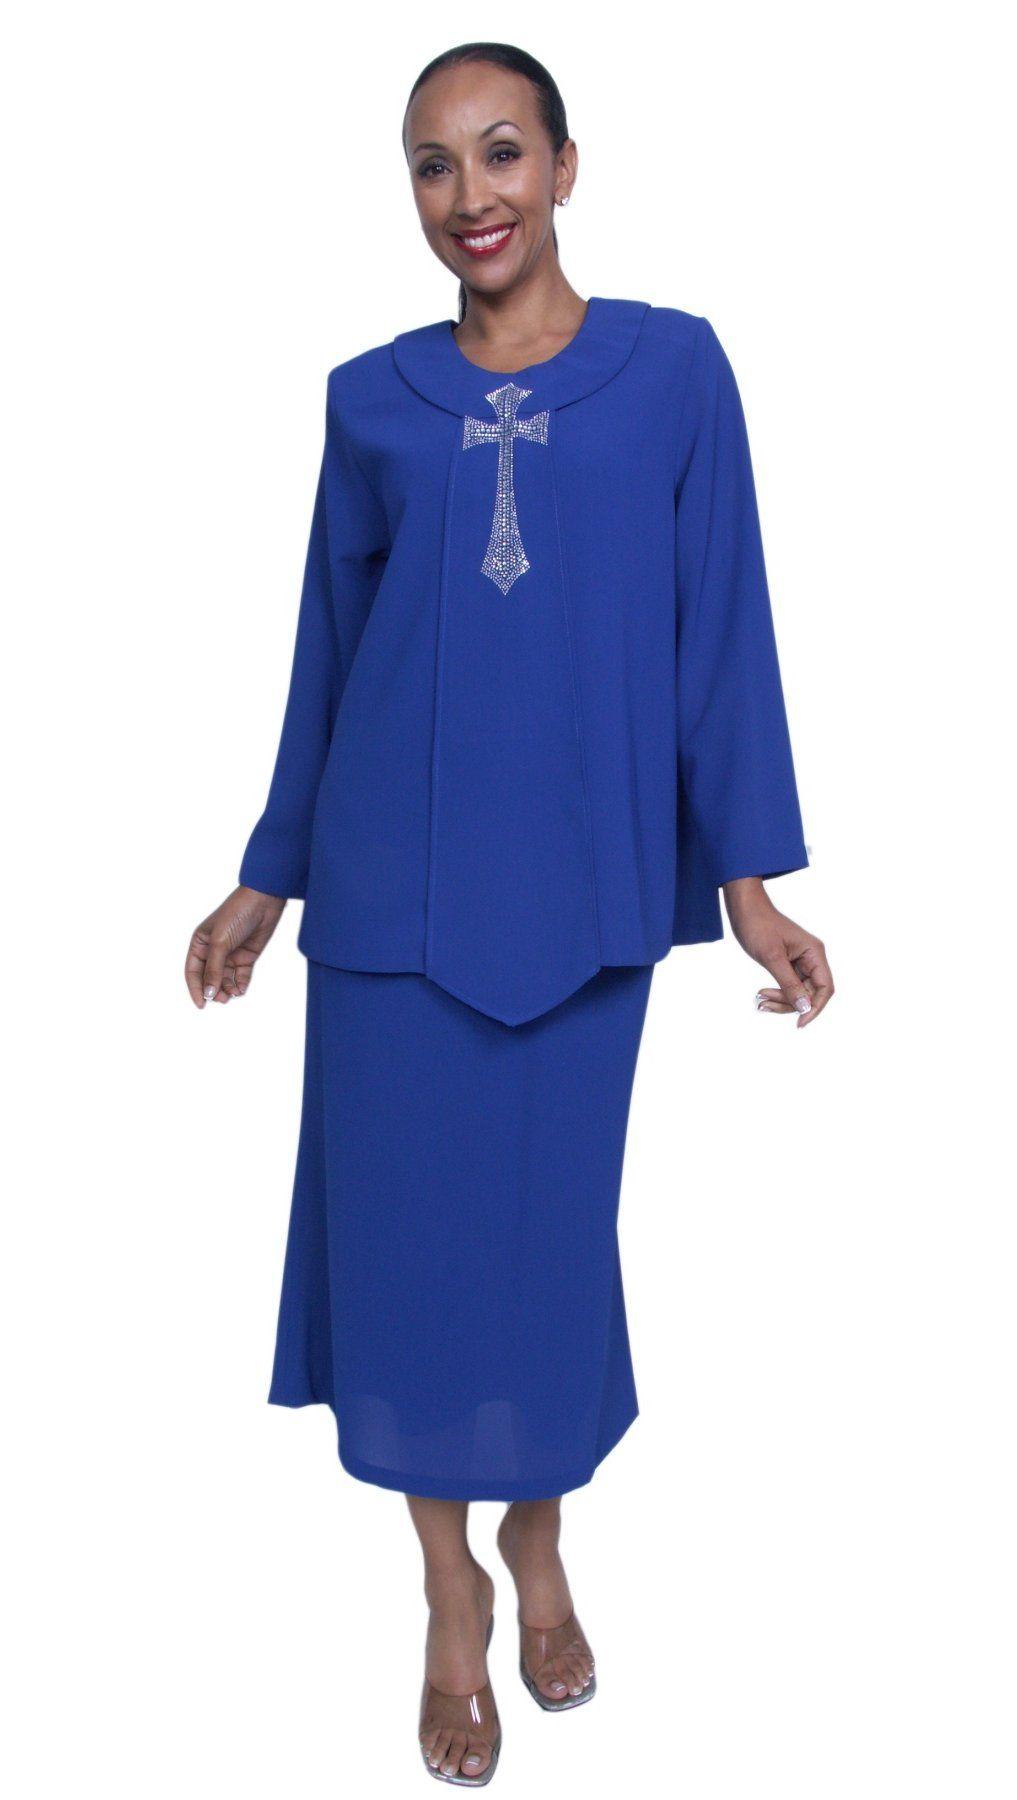 Plus Size Royal Blue Church Choir 4 Piece Dress Set Skirt Jacket Top ...